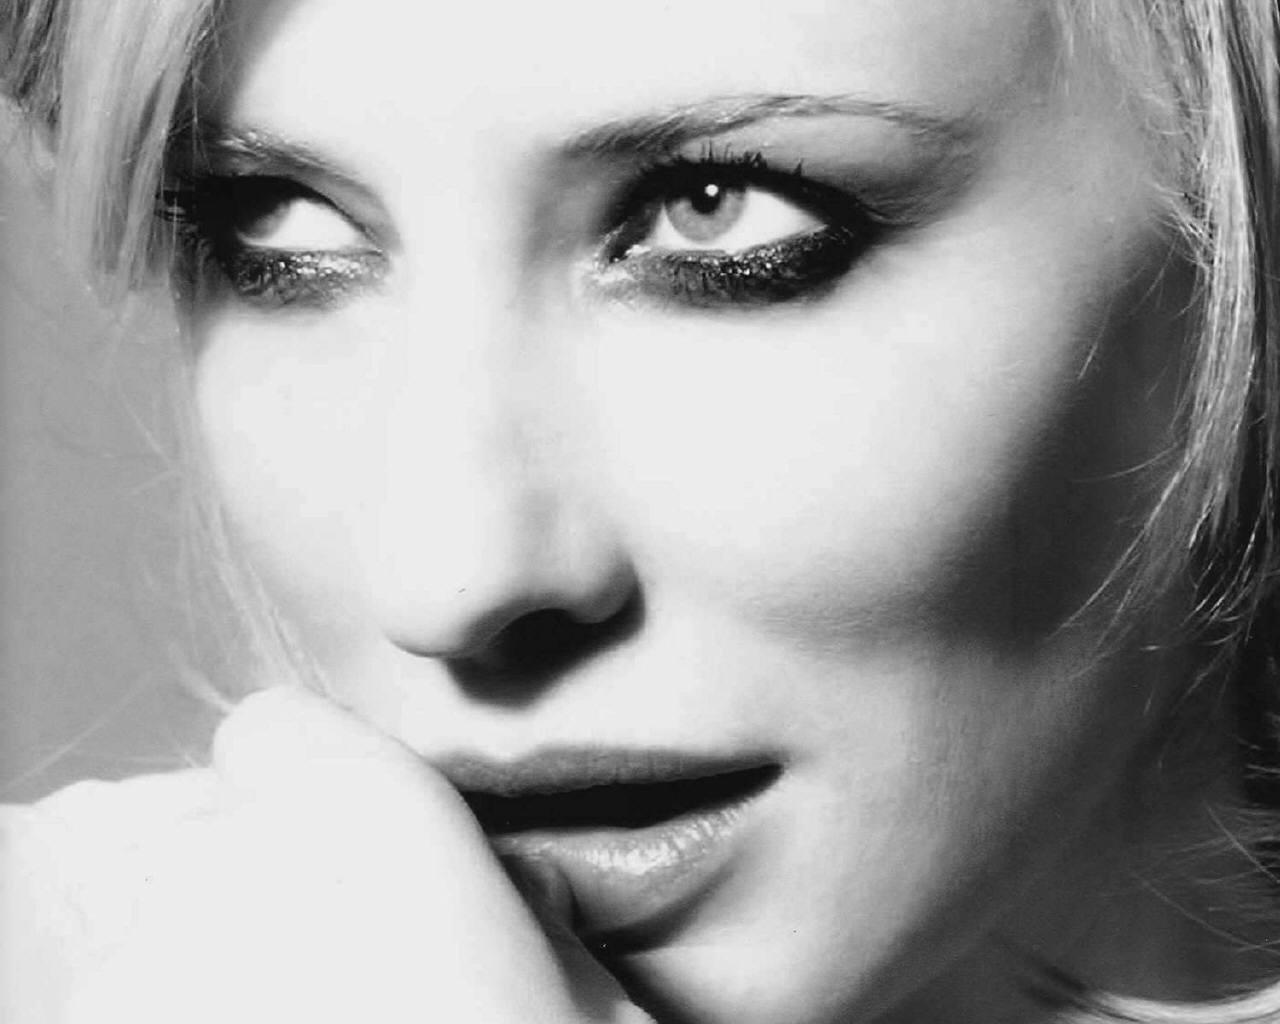 ... Cate Blanchett Wallpapers-4 ...